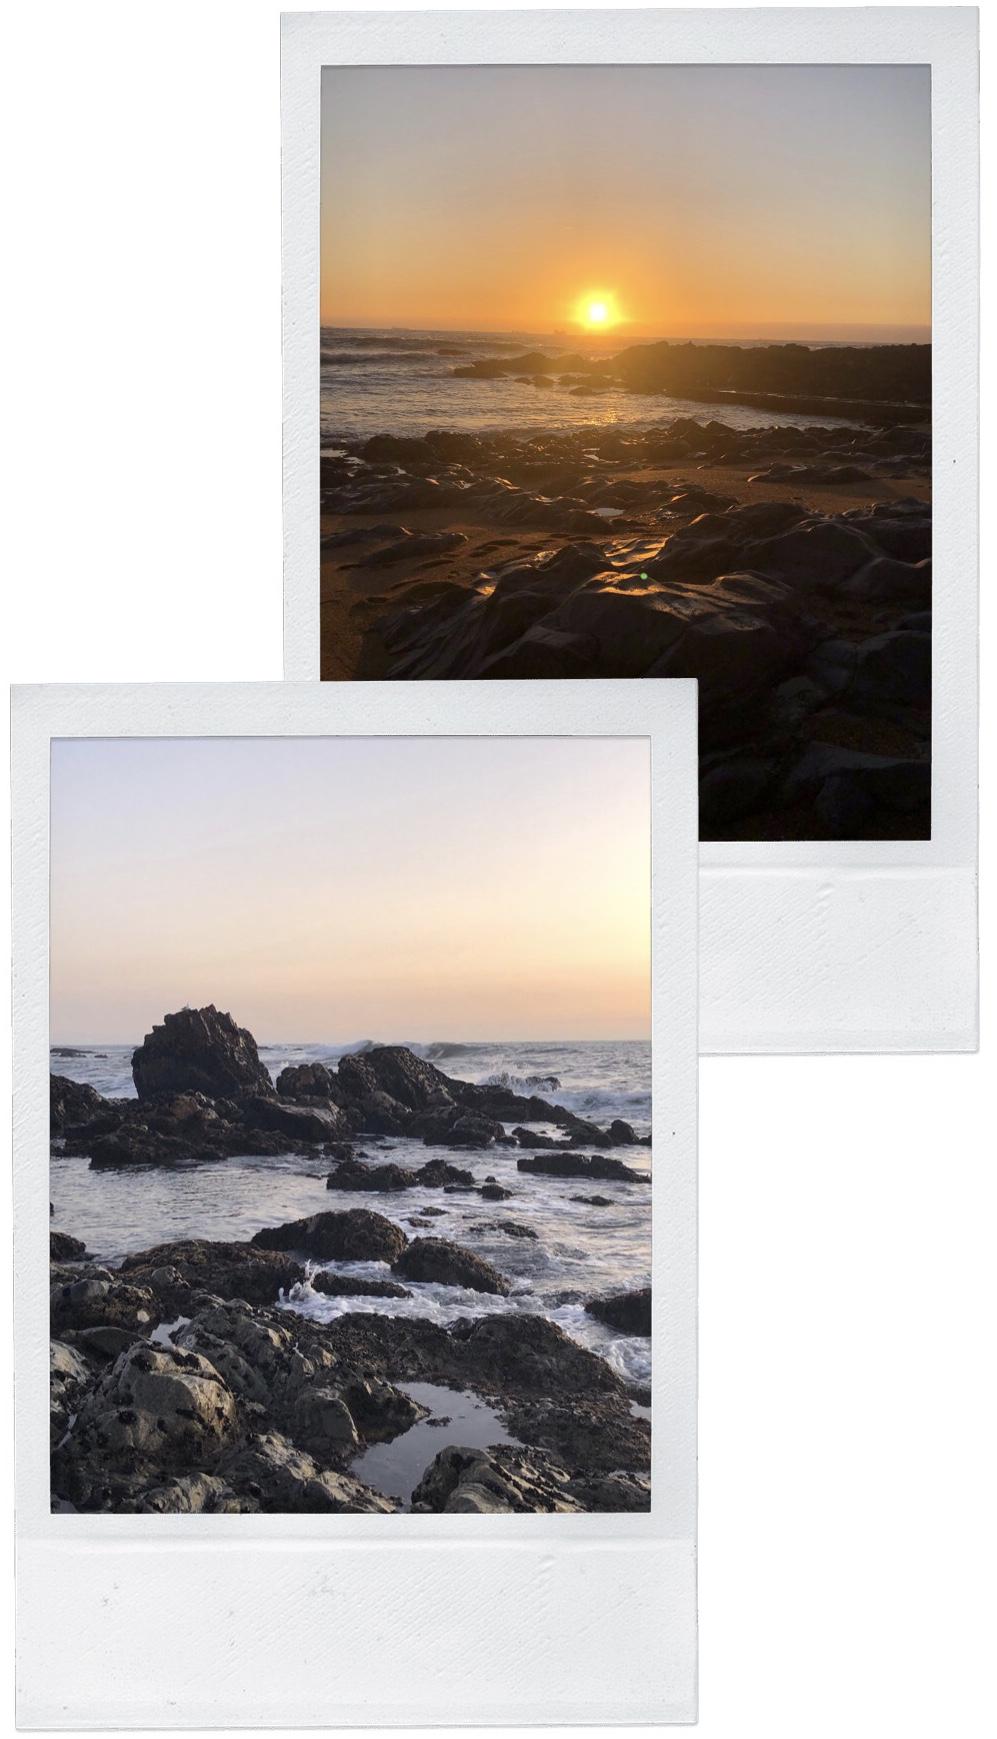 Porto-Reisebericht-Sightseeing-Tipps-Strand-Gondarem-Sonnenuntergang-Felsen-Miss-Suzie-Loves